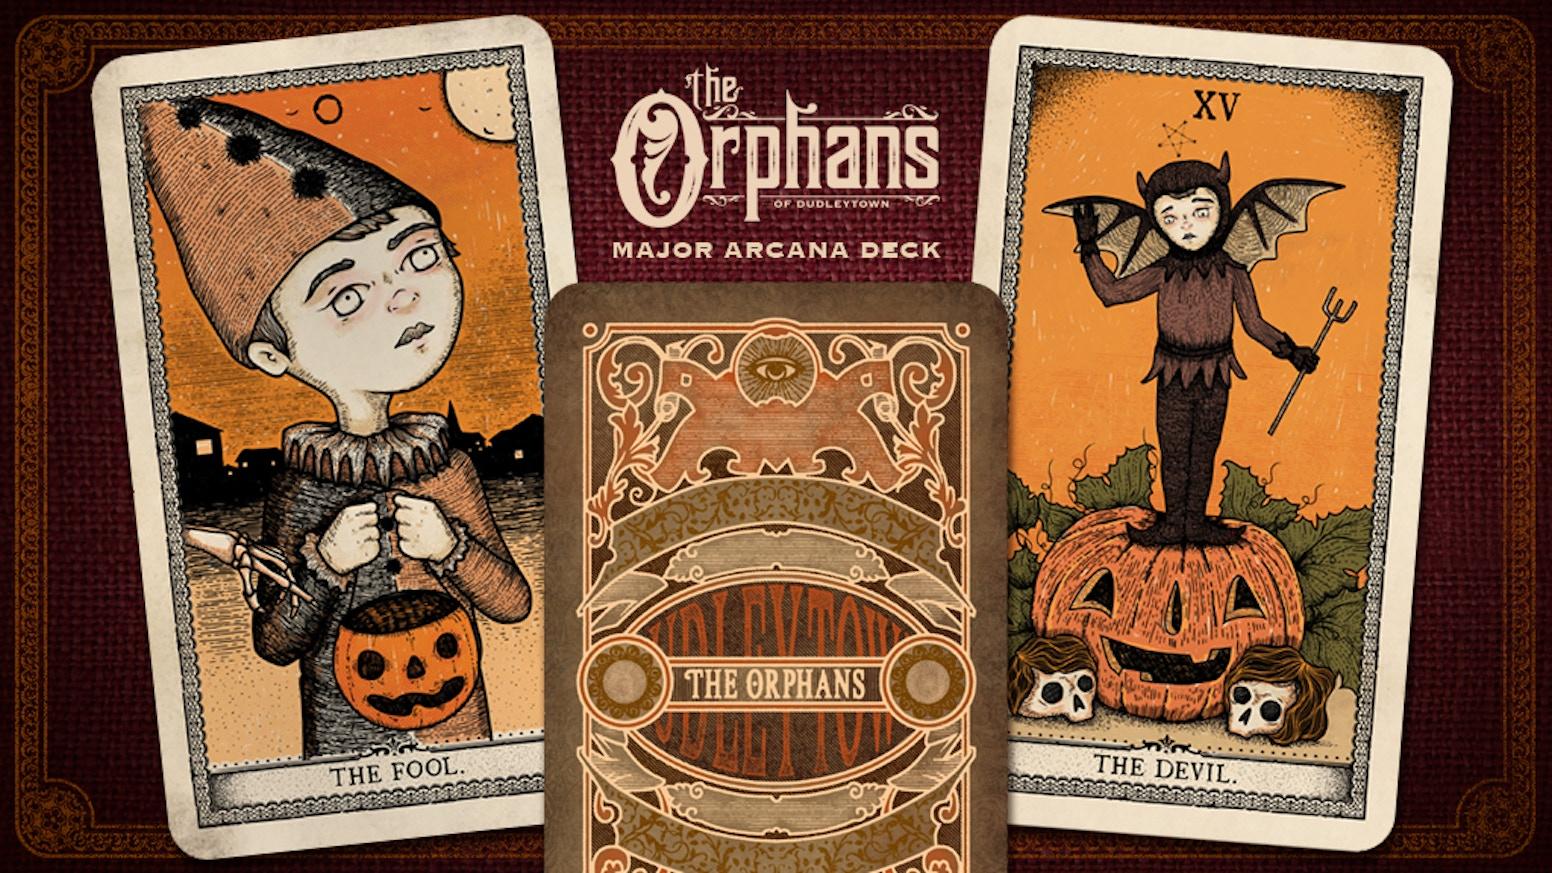 An illustrated Victorian era, halloween inspired major arcana tarot deck featuring the Orphans.